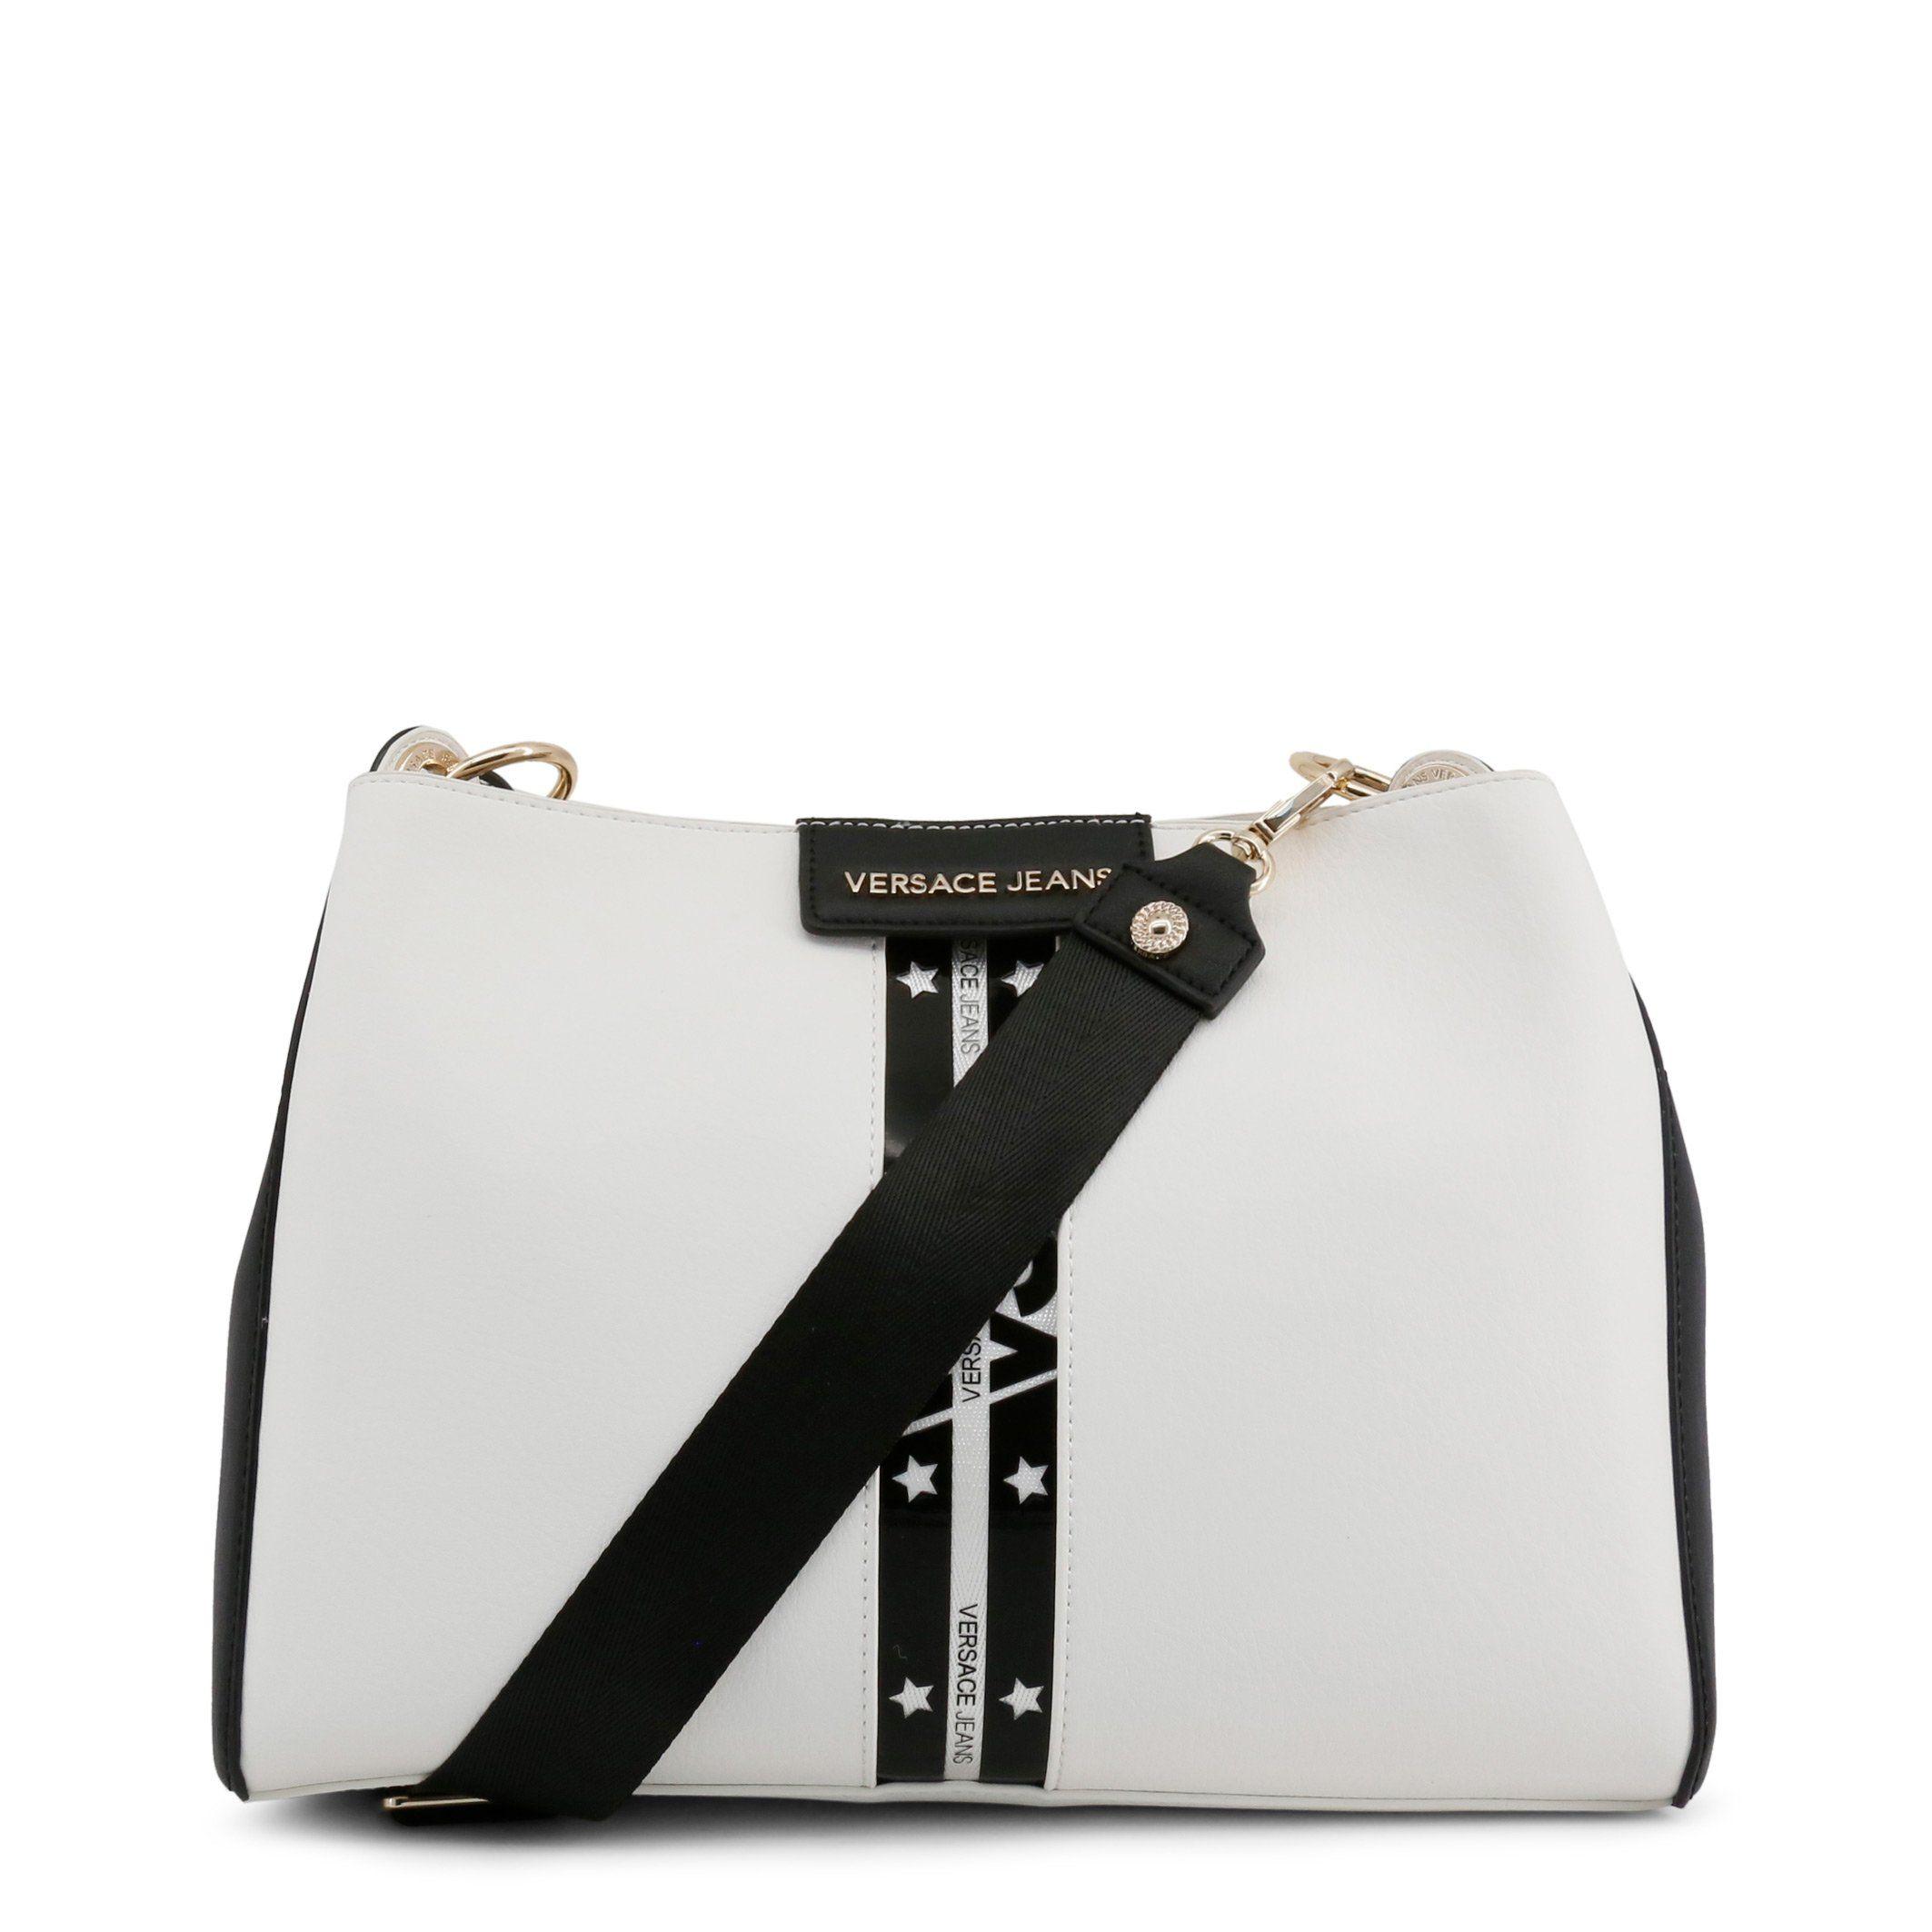 Versace Jeans E1VRBBN3 70048. Versace Jeans E1VRBBN3 70048 Clothing Deals,  White Crossbody Bag ... d7c3b2d1c2